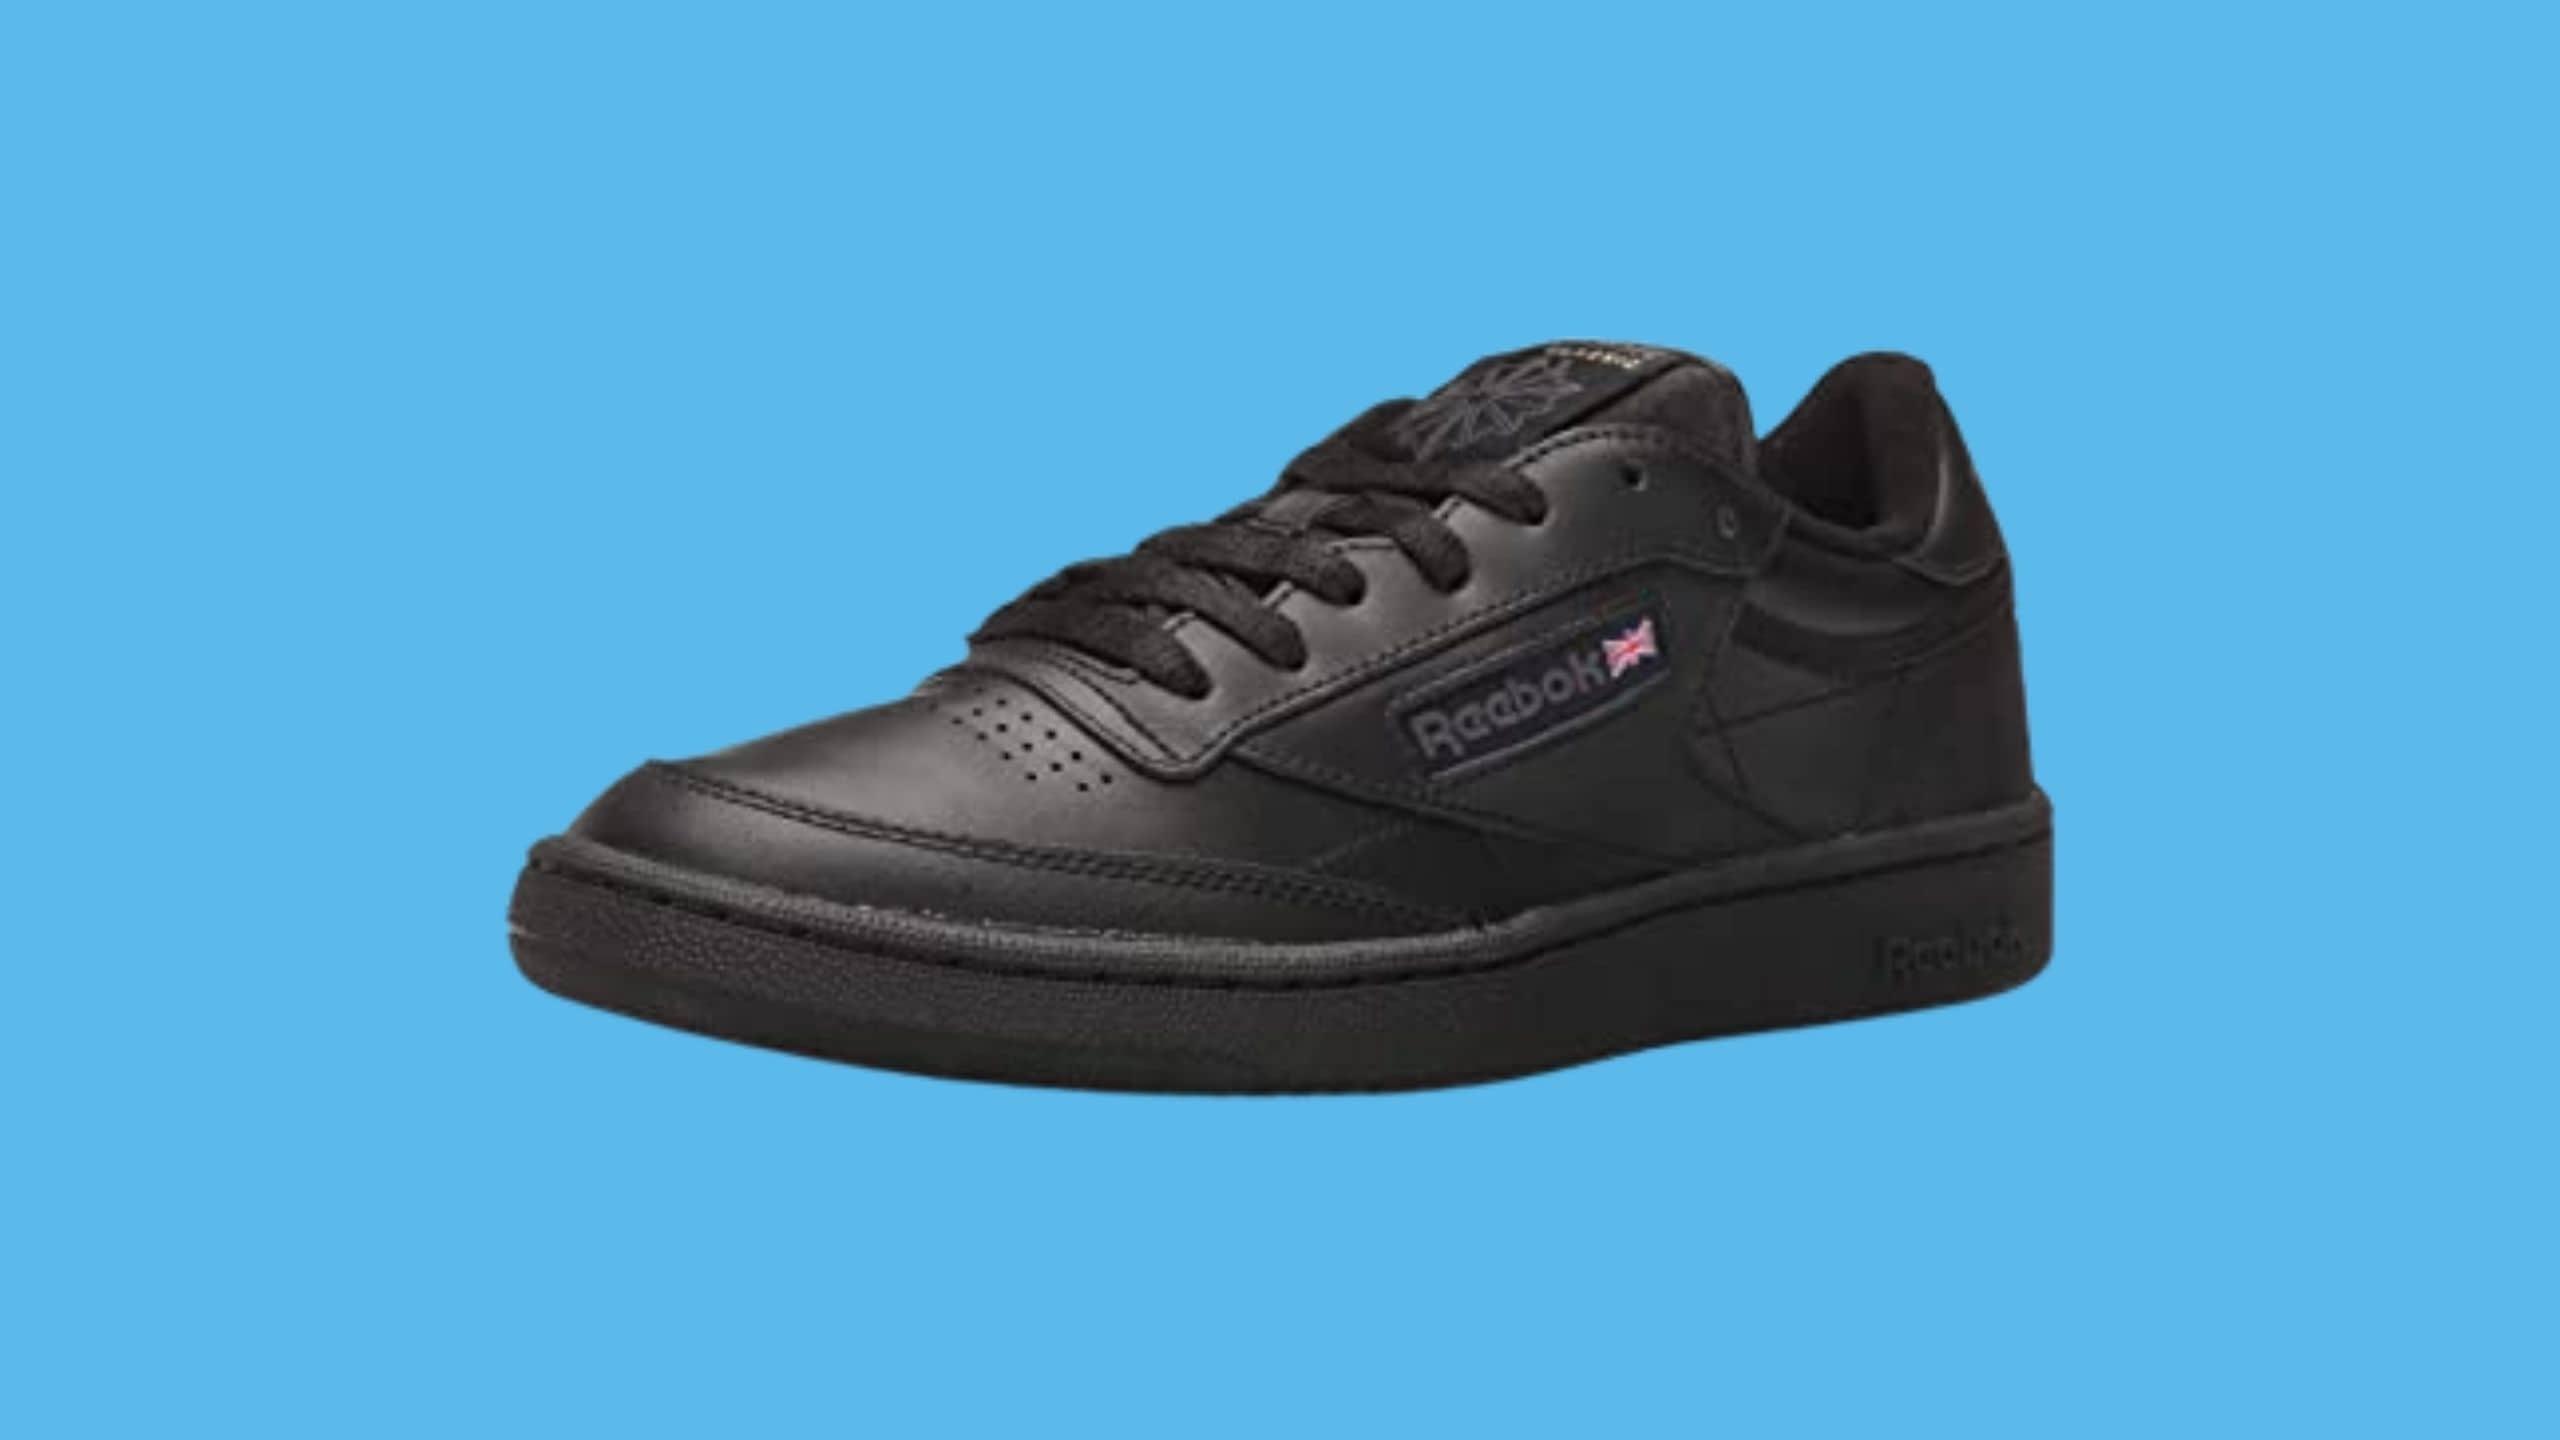 Reebok Women's Club Vintage Shoes for Concerts